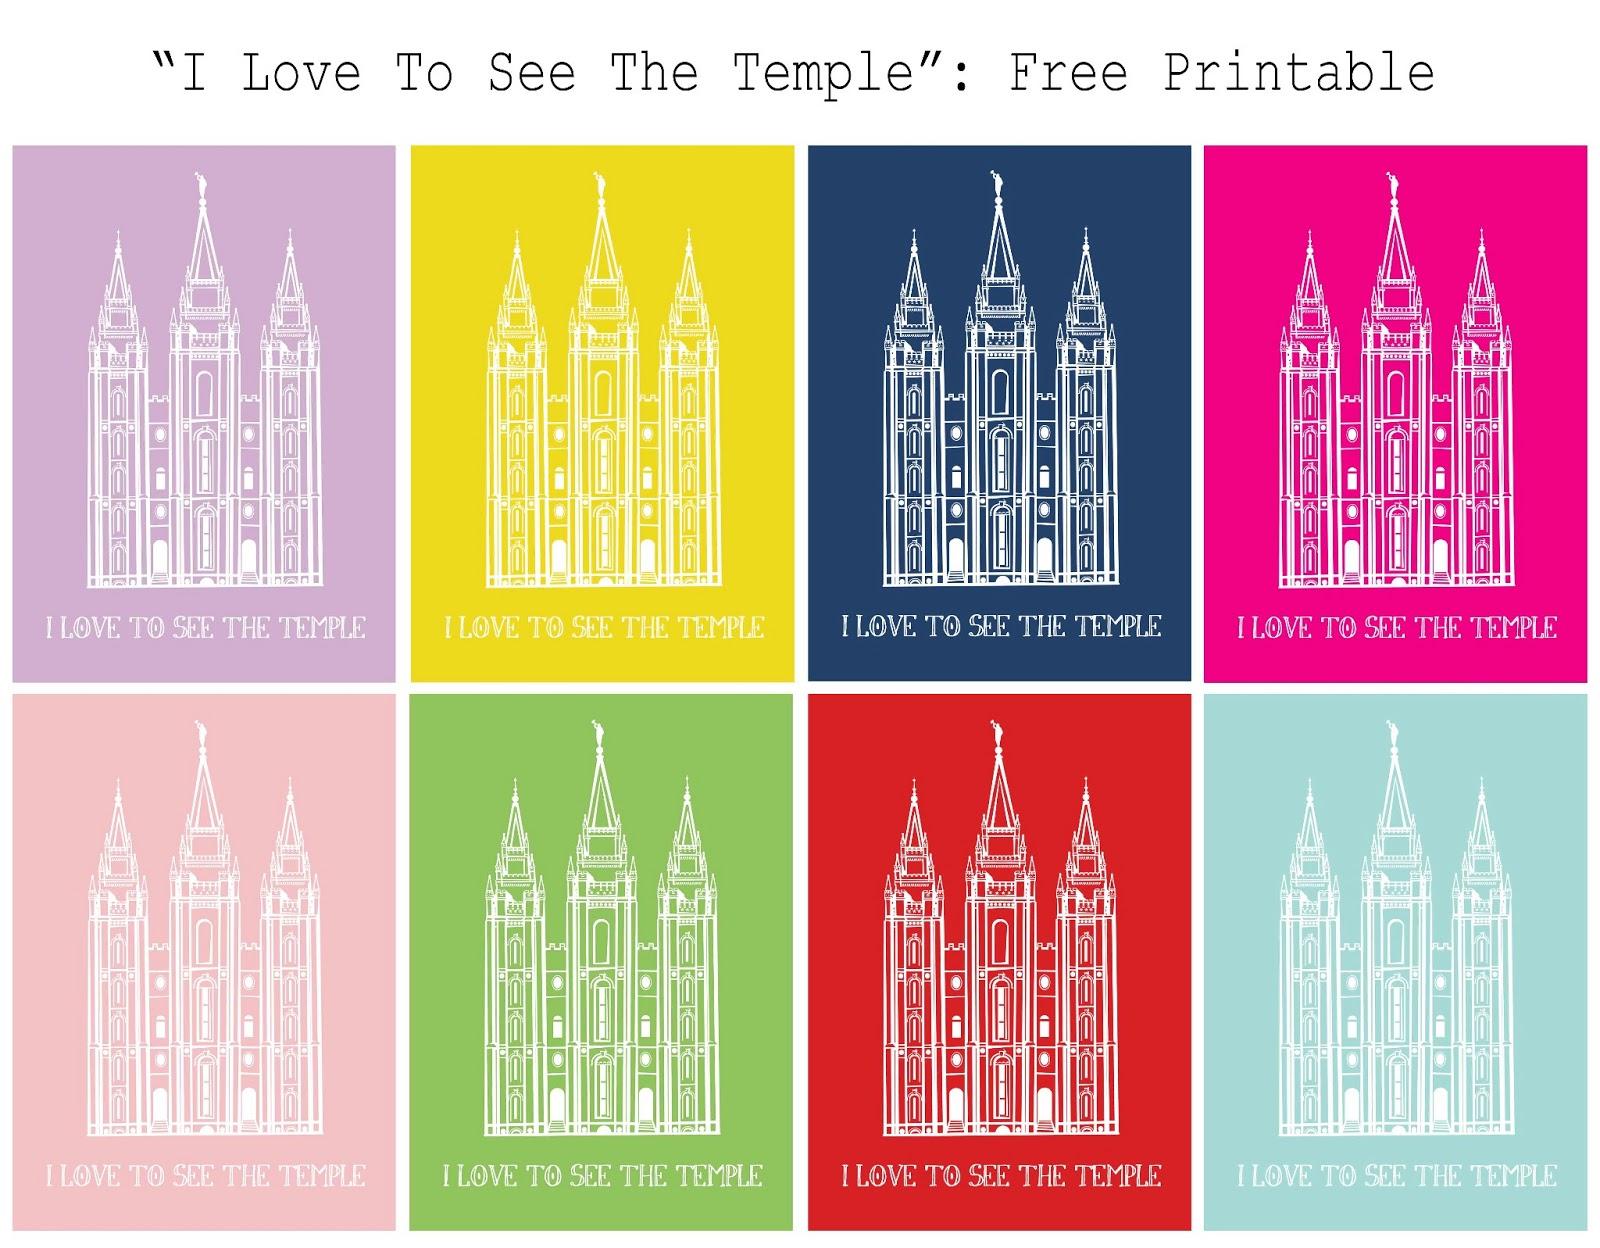 The Caldwells: Free Printable: I Love To See The Temple - Free Printable Sud